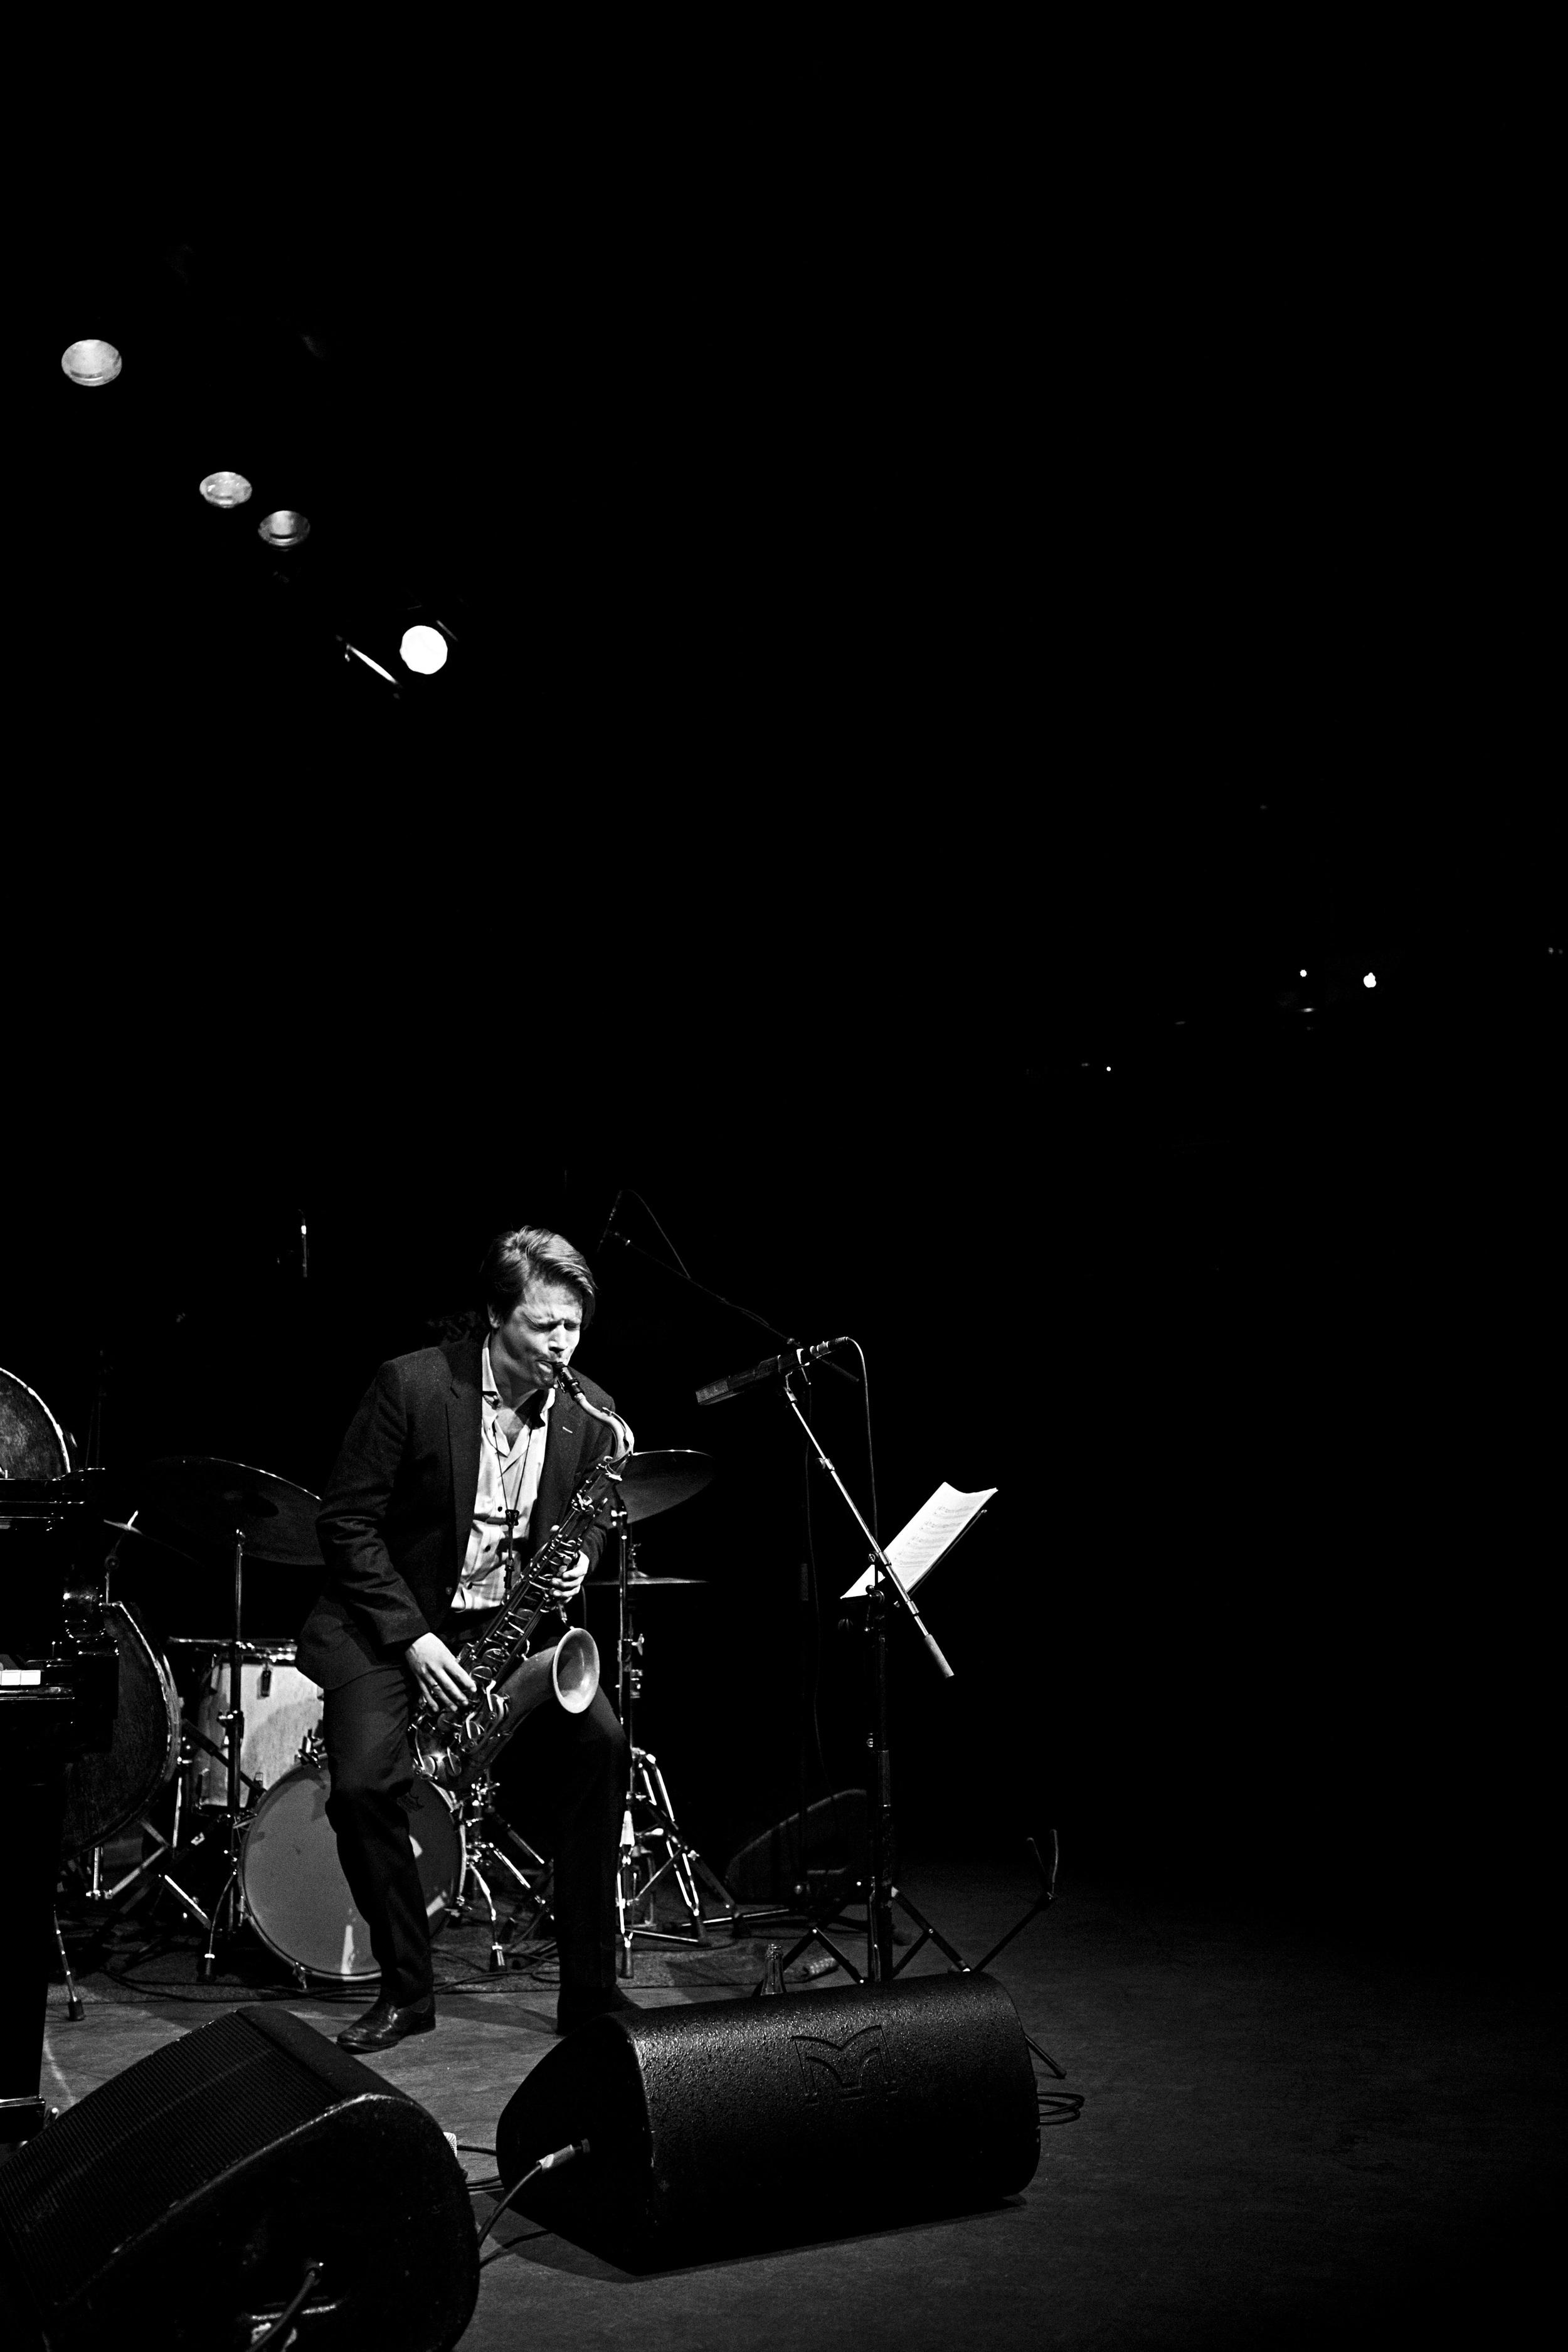 fabian stuertz 2016.02.28 - denis gäbel quartet - stadtgarten 0024-bw.jpg